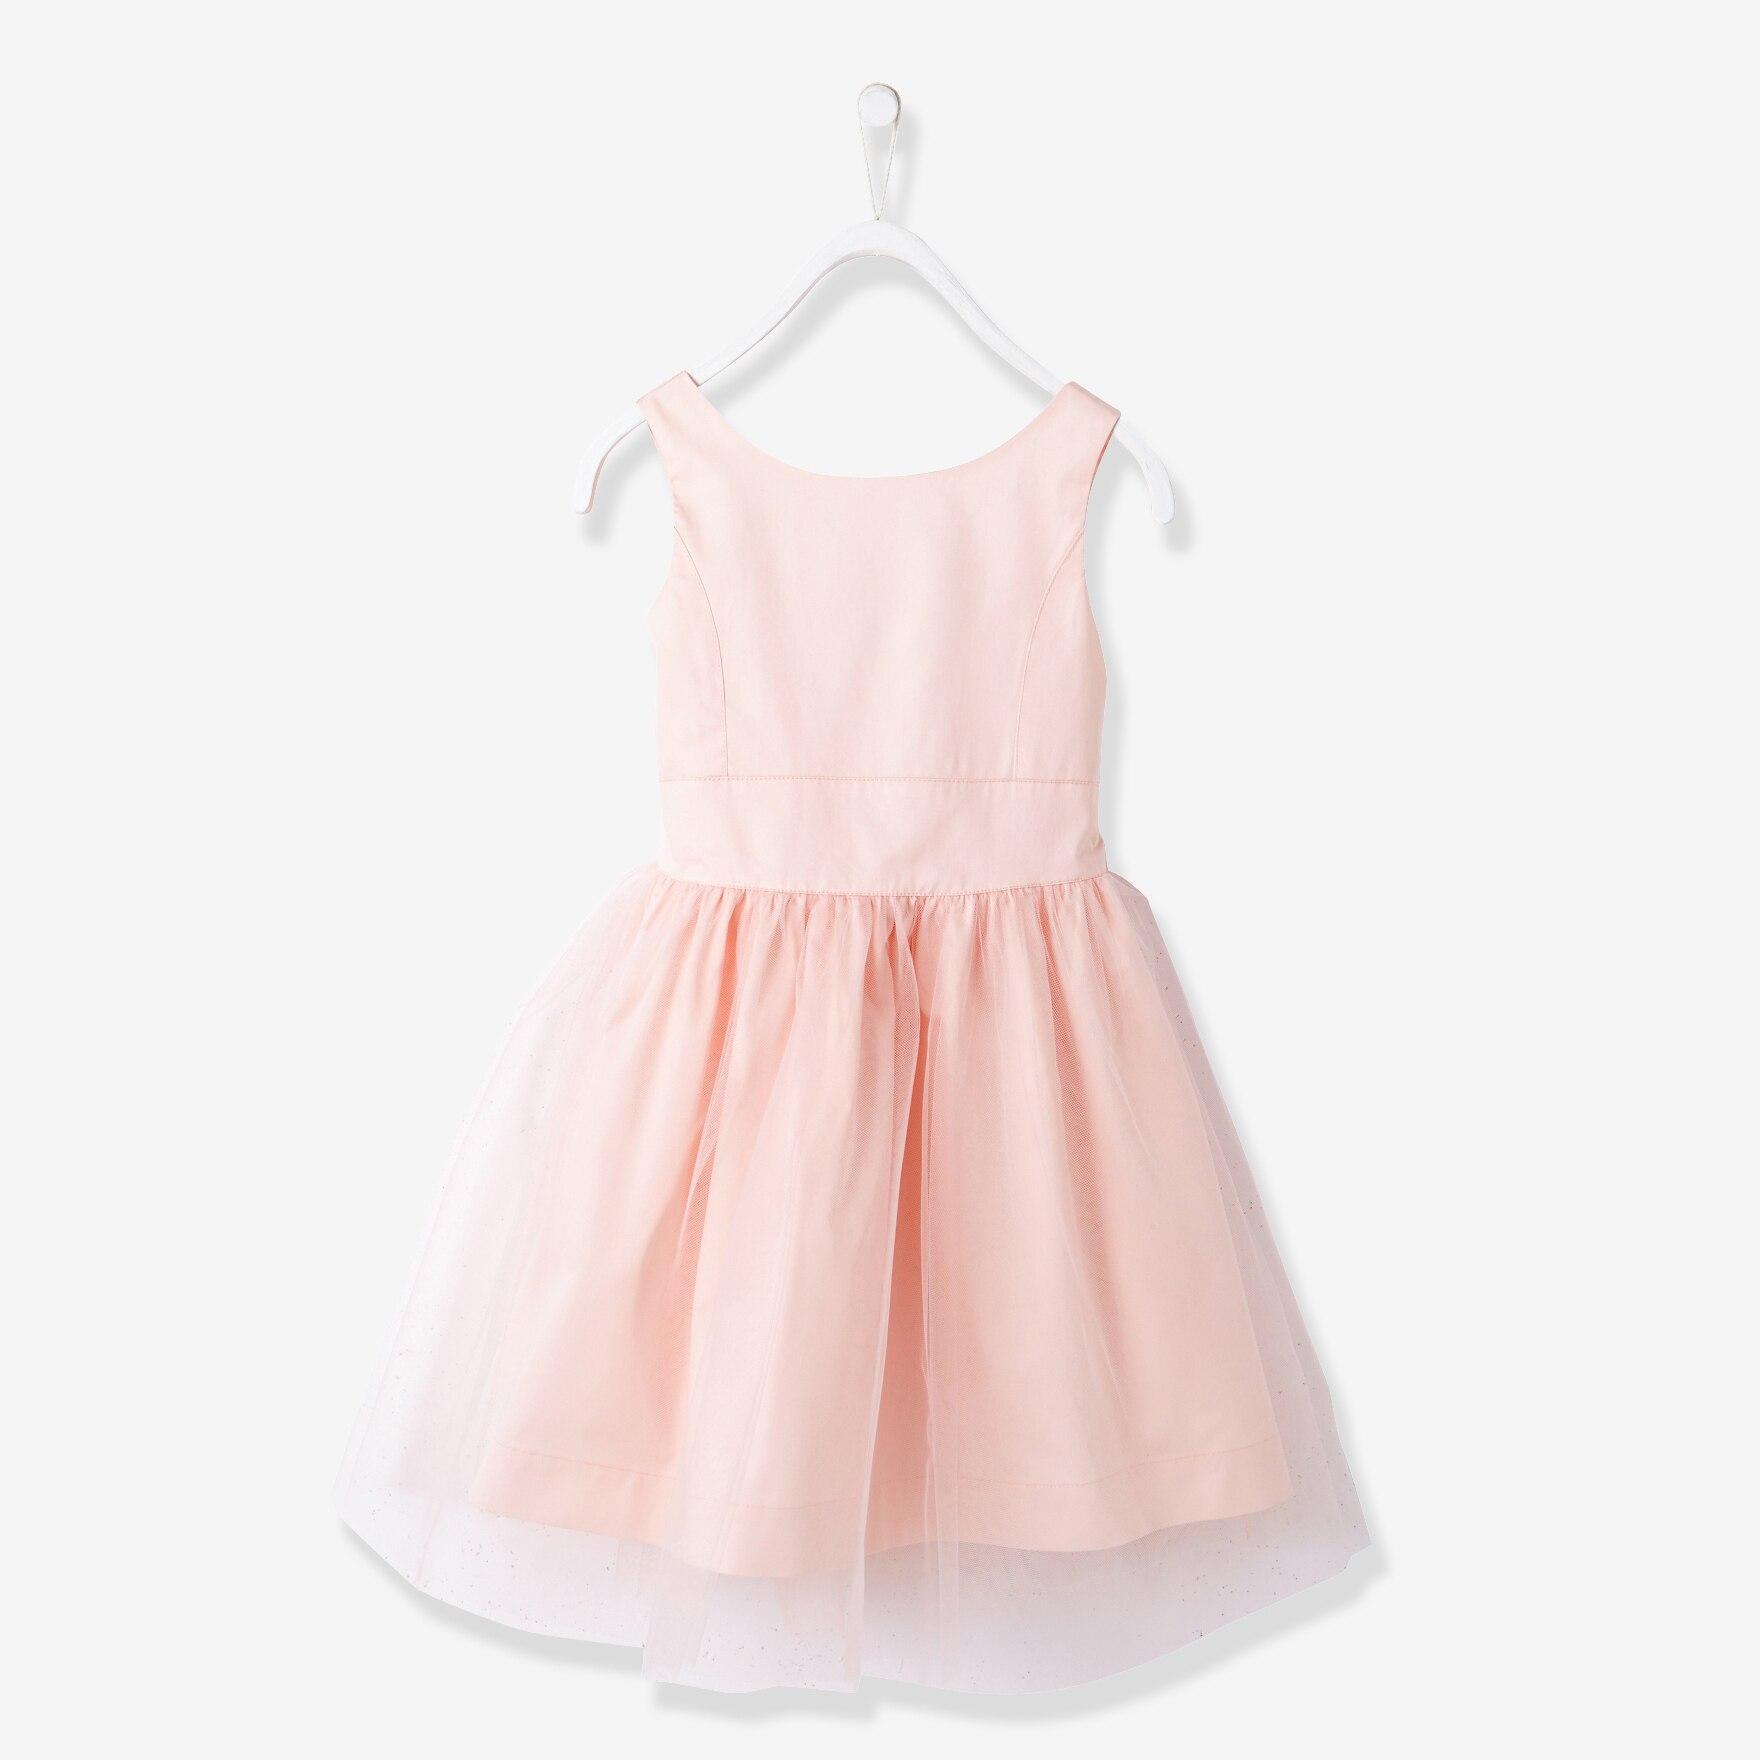 A halter dress Fairy Princess Pink Bow children 17 girls in a summer dress светильники trousselier абажур princess fairy 34х22 см